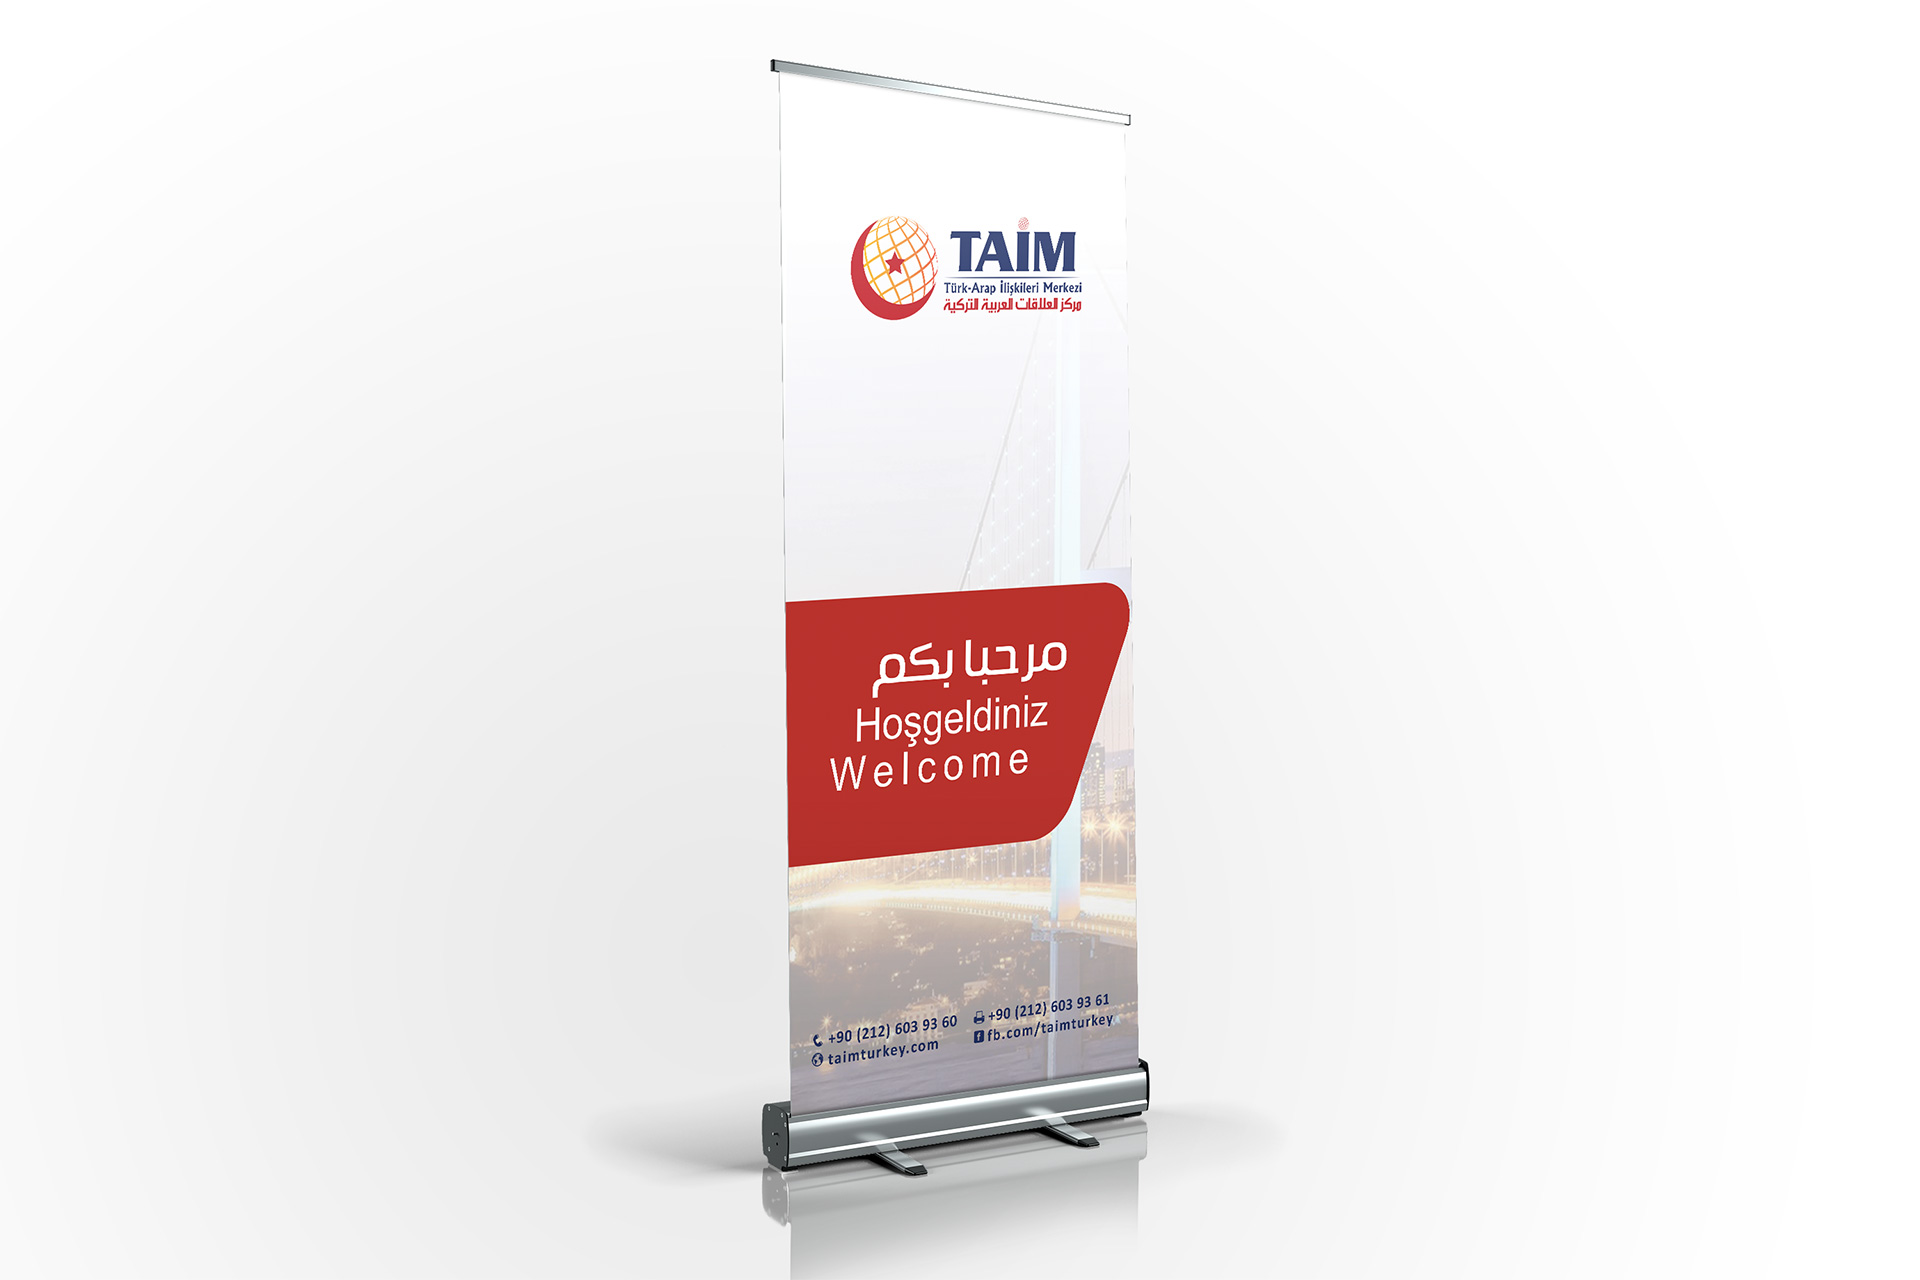 2P - خدمات العلاقات العامة والتسويق الرقمي -مركز العلاقات العربية التركية